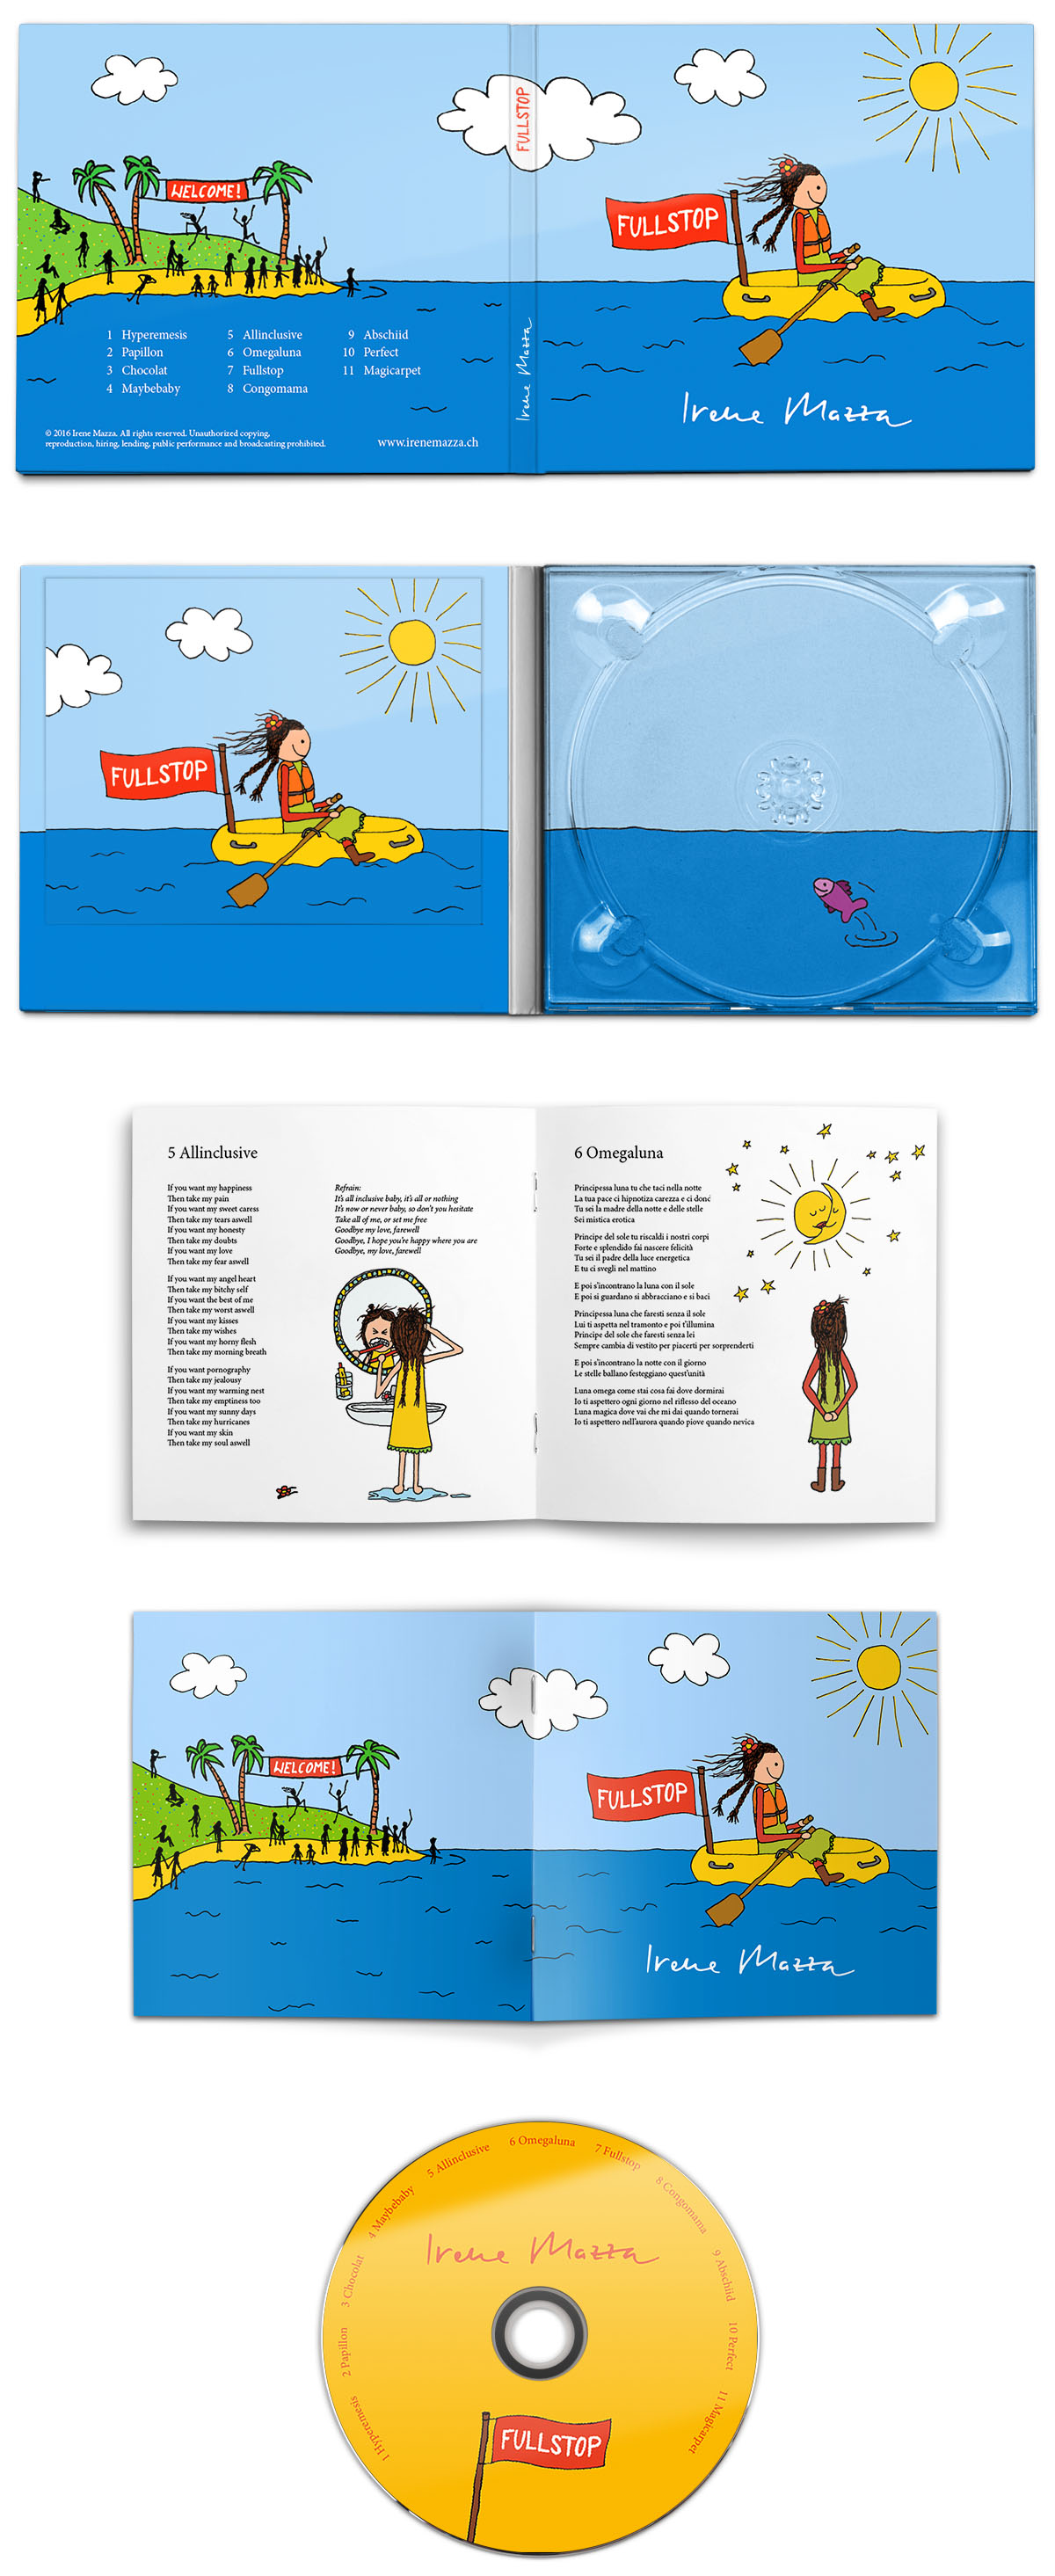 CD-Gestaltung Irene Mazza